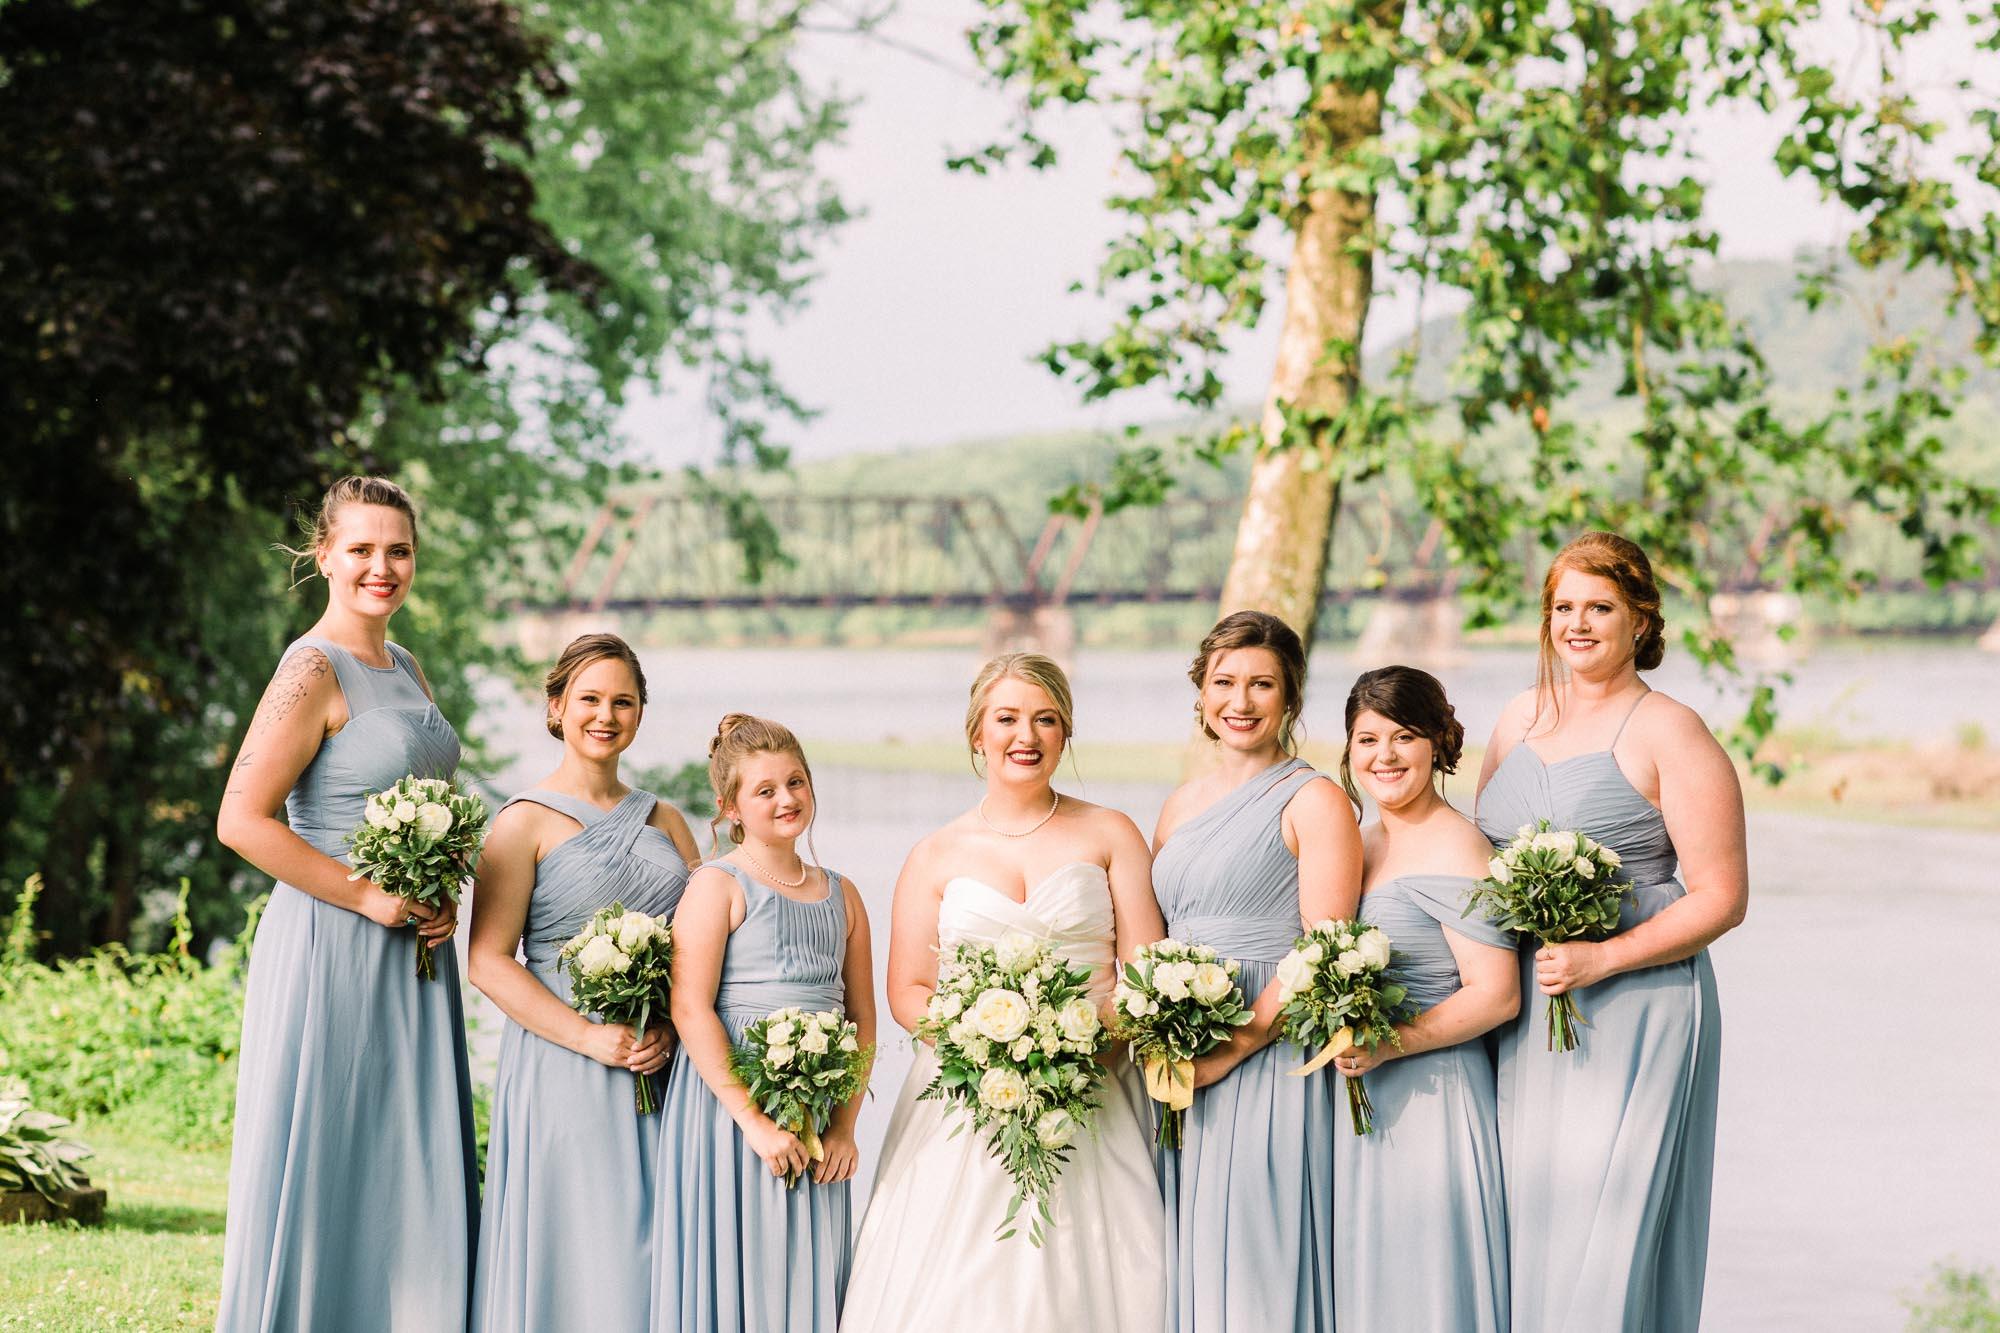 isle-of-que-wedding-4023.jpg